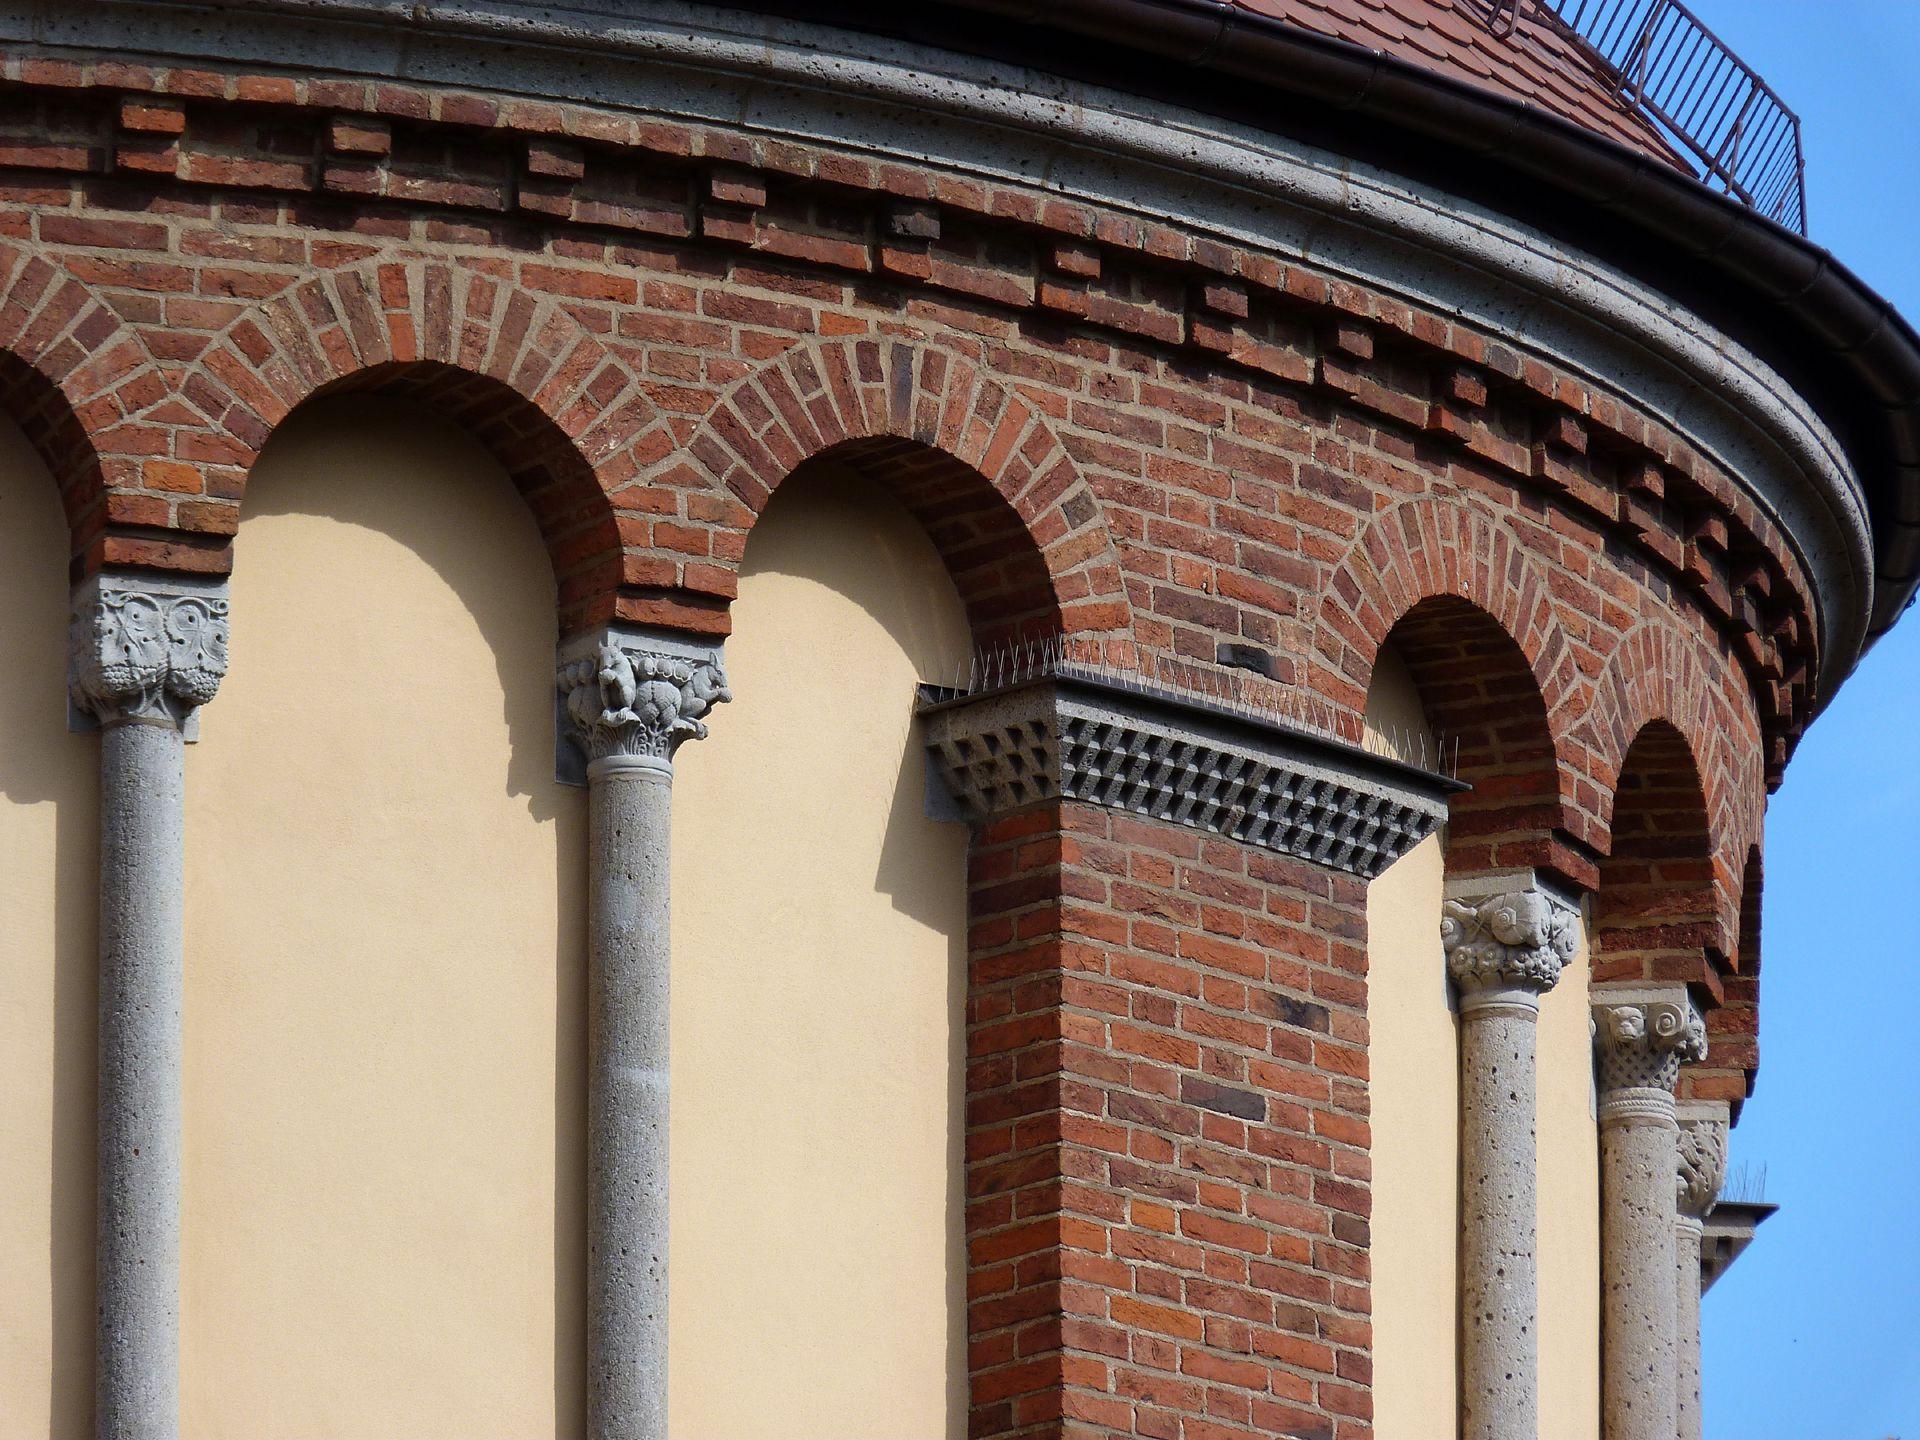 St. Anton Apsis, Blendarkaden